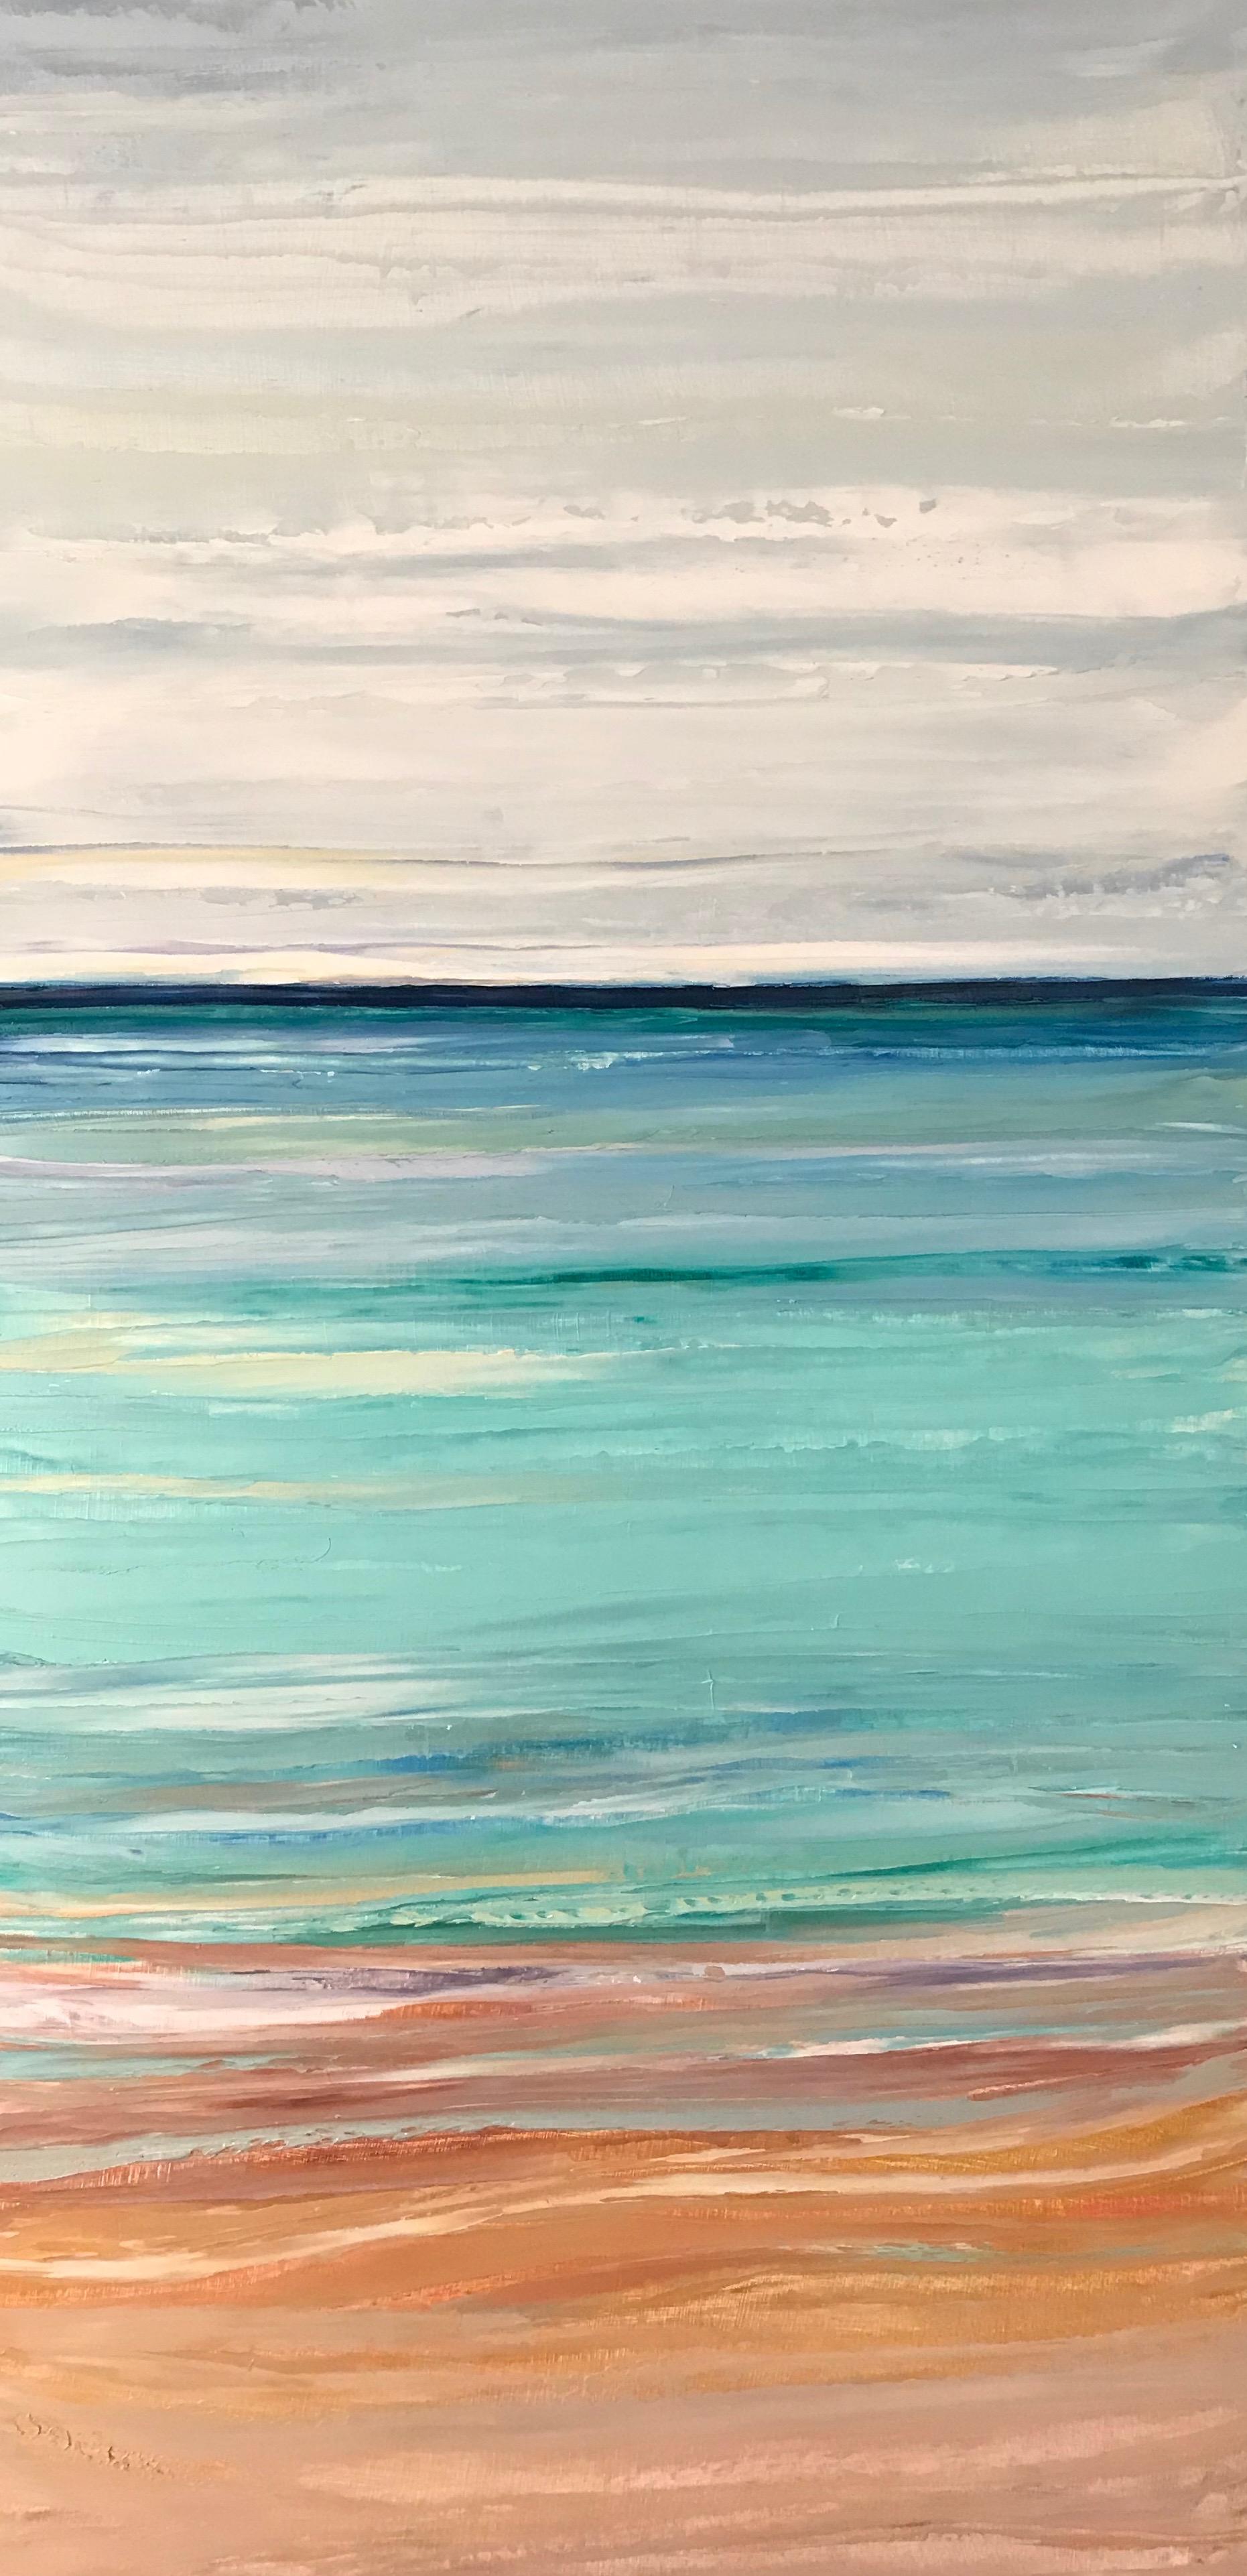 """Sea Meets Sand"" 24x12 inch Oil on Wood"